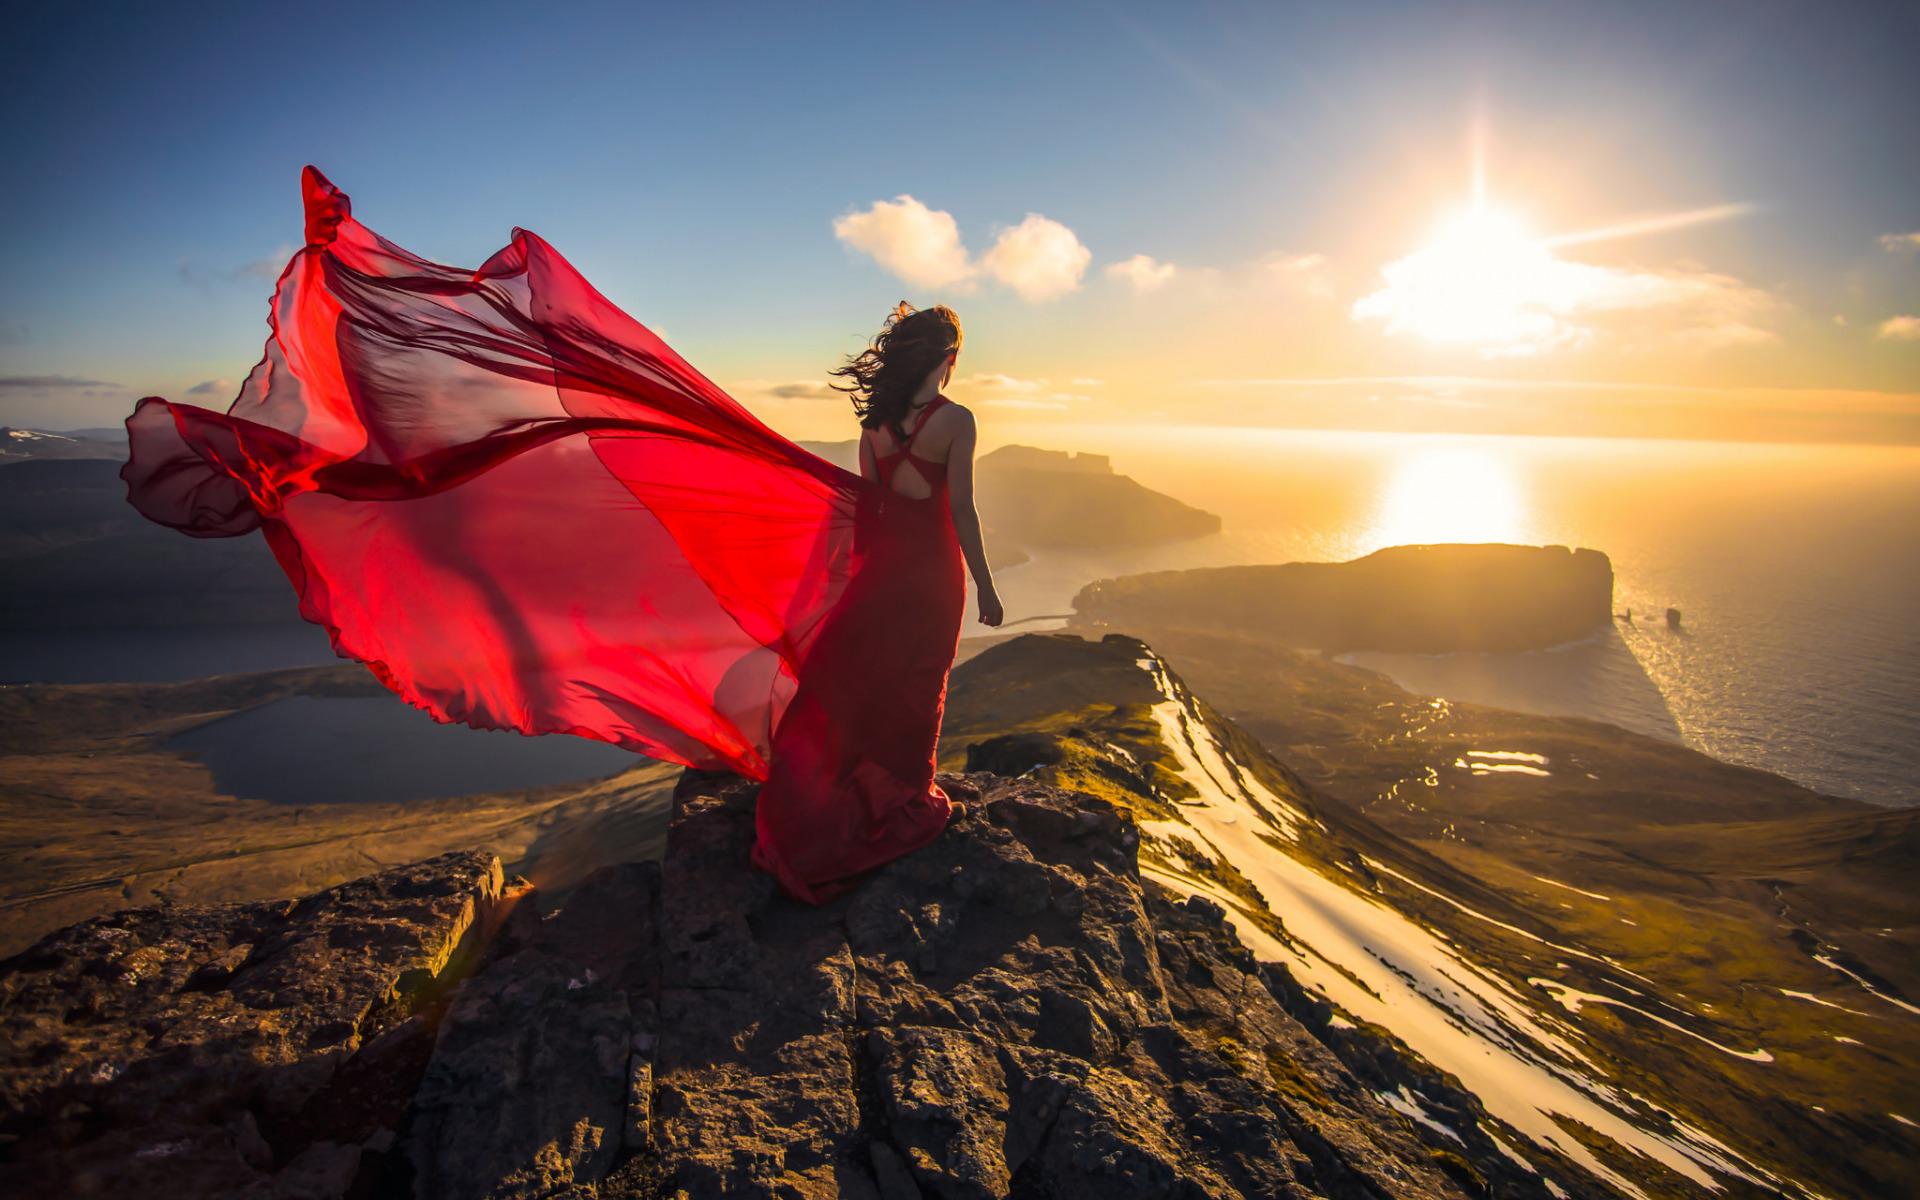 Девушки в платьях на ветру фото, фото темного между ног